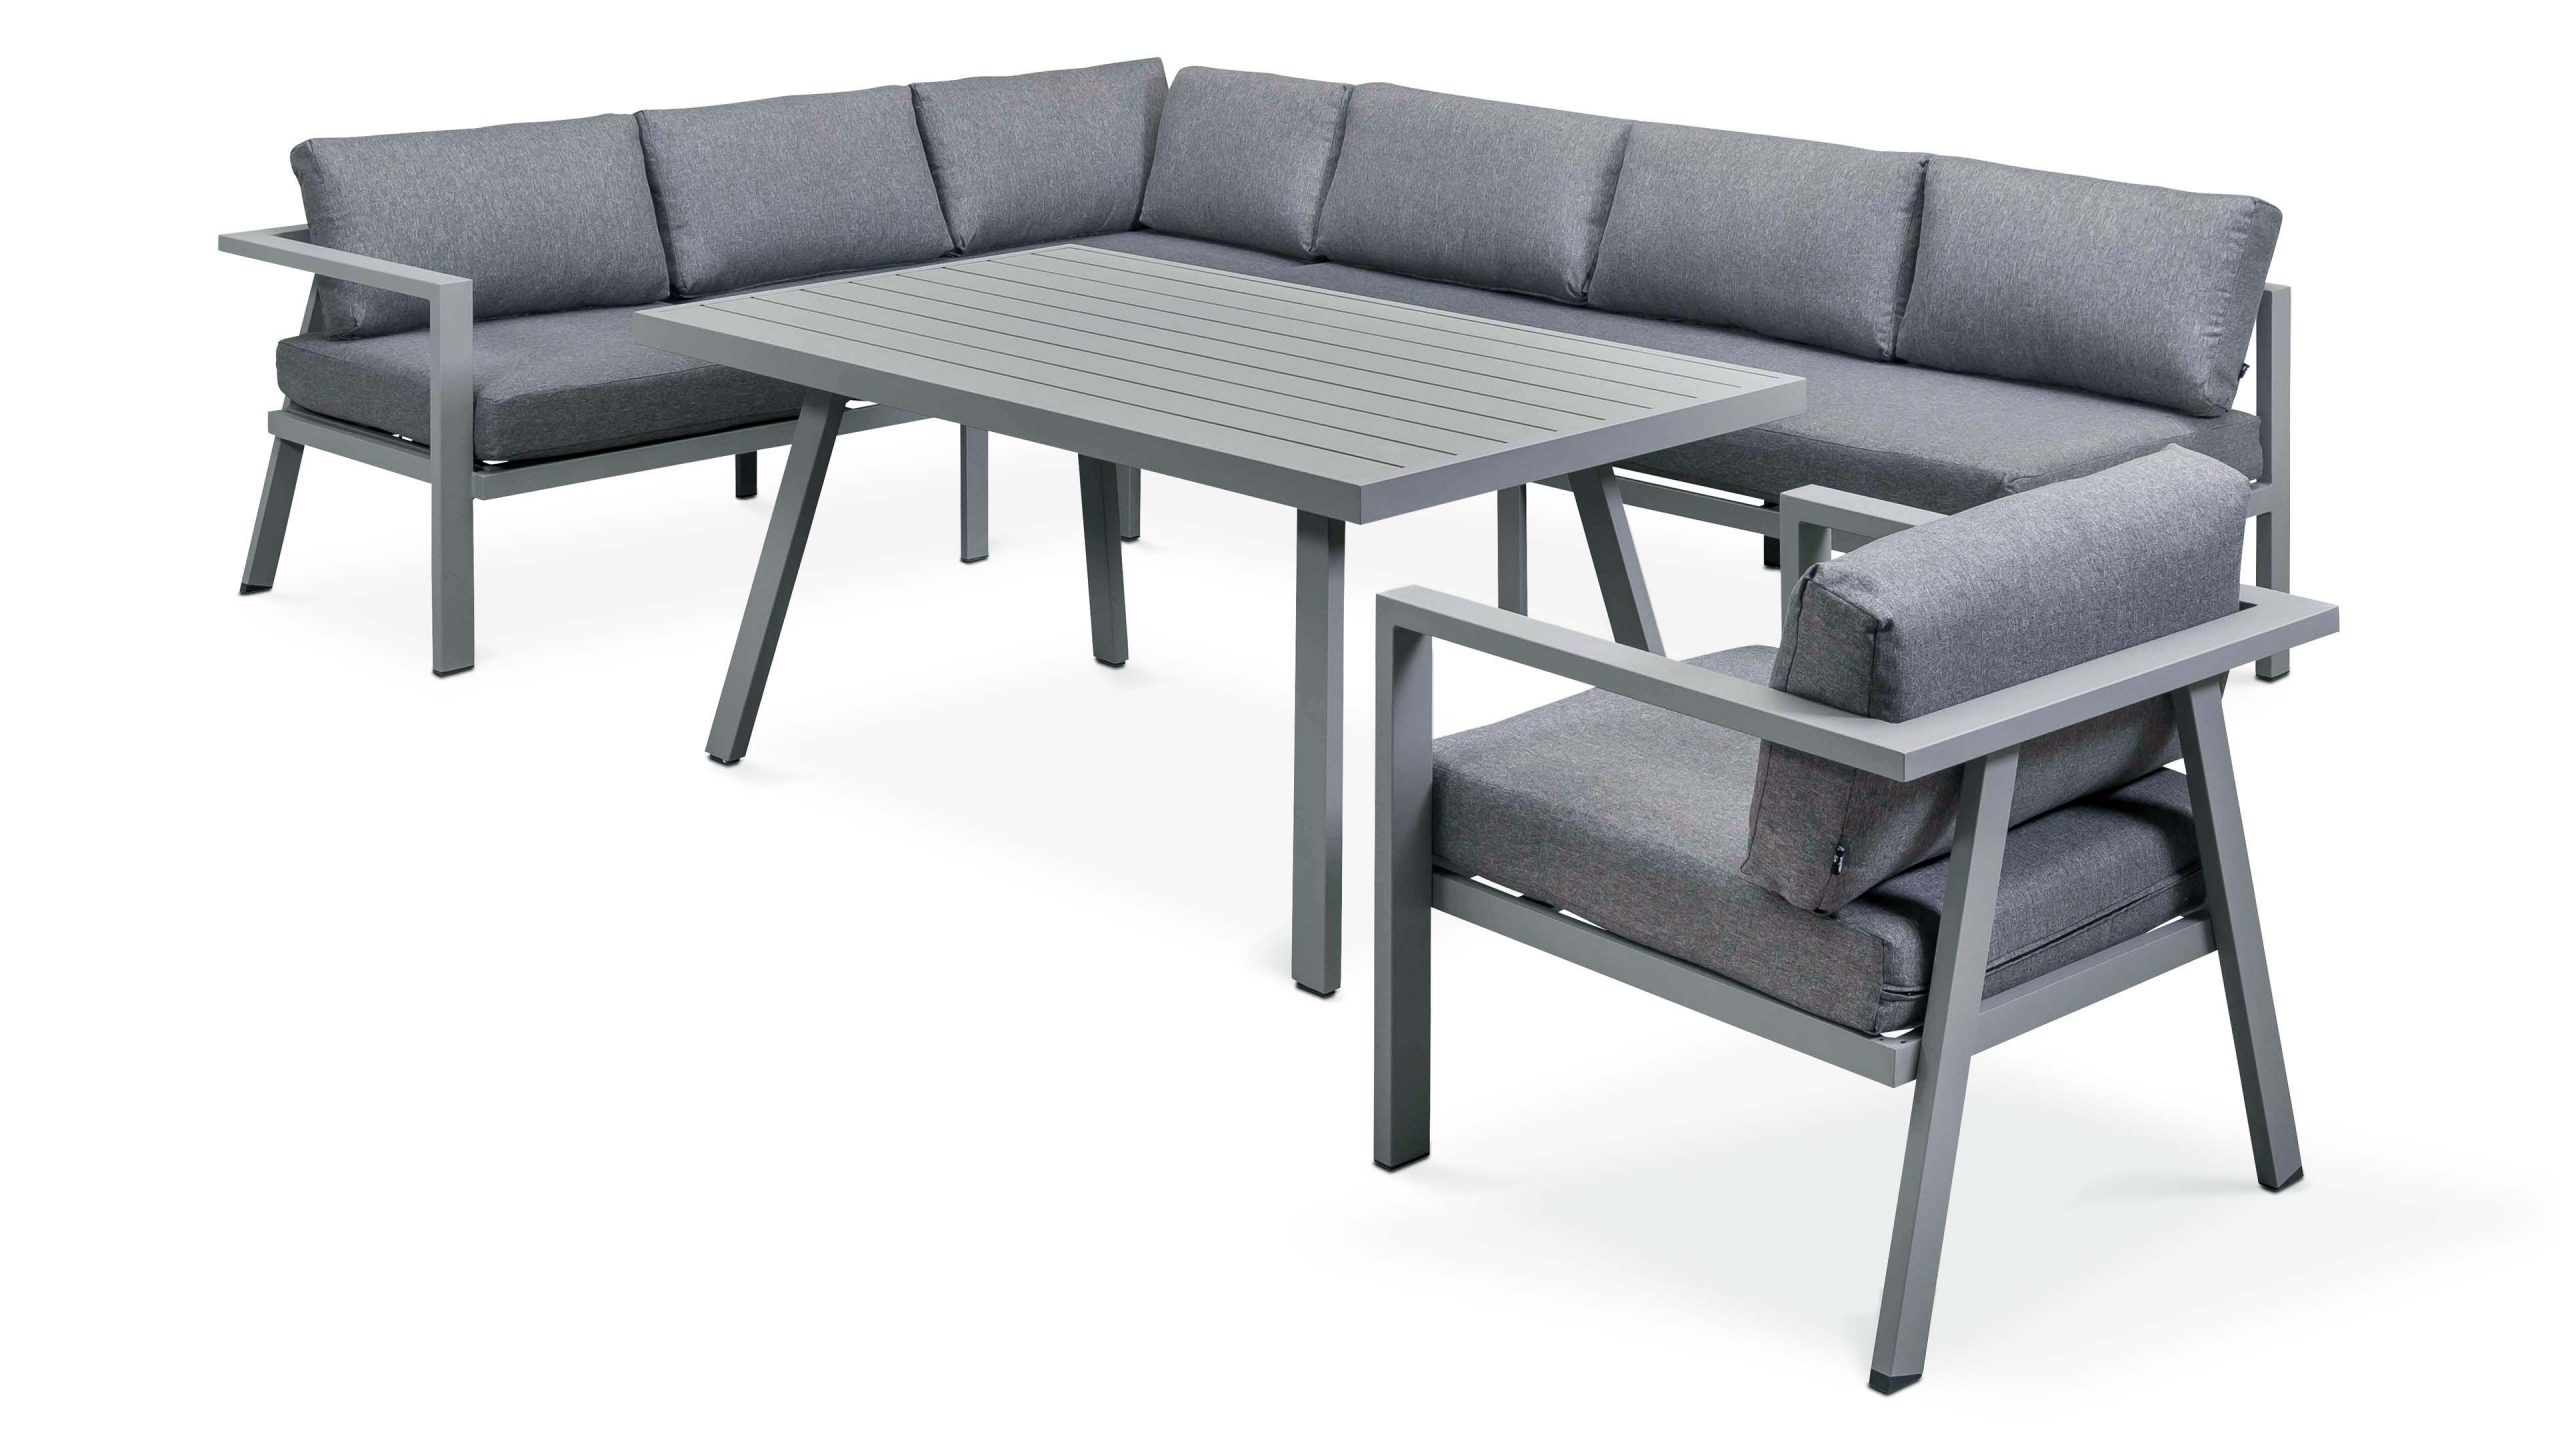 Salon Jardin Table Fauteuil Canapé D'angle pour Salon De Jardin Aluminium Et Composite